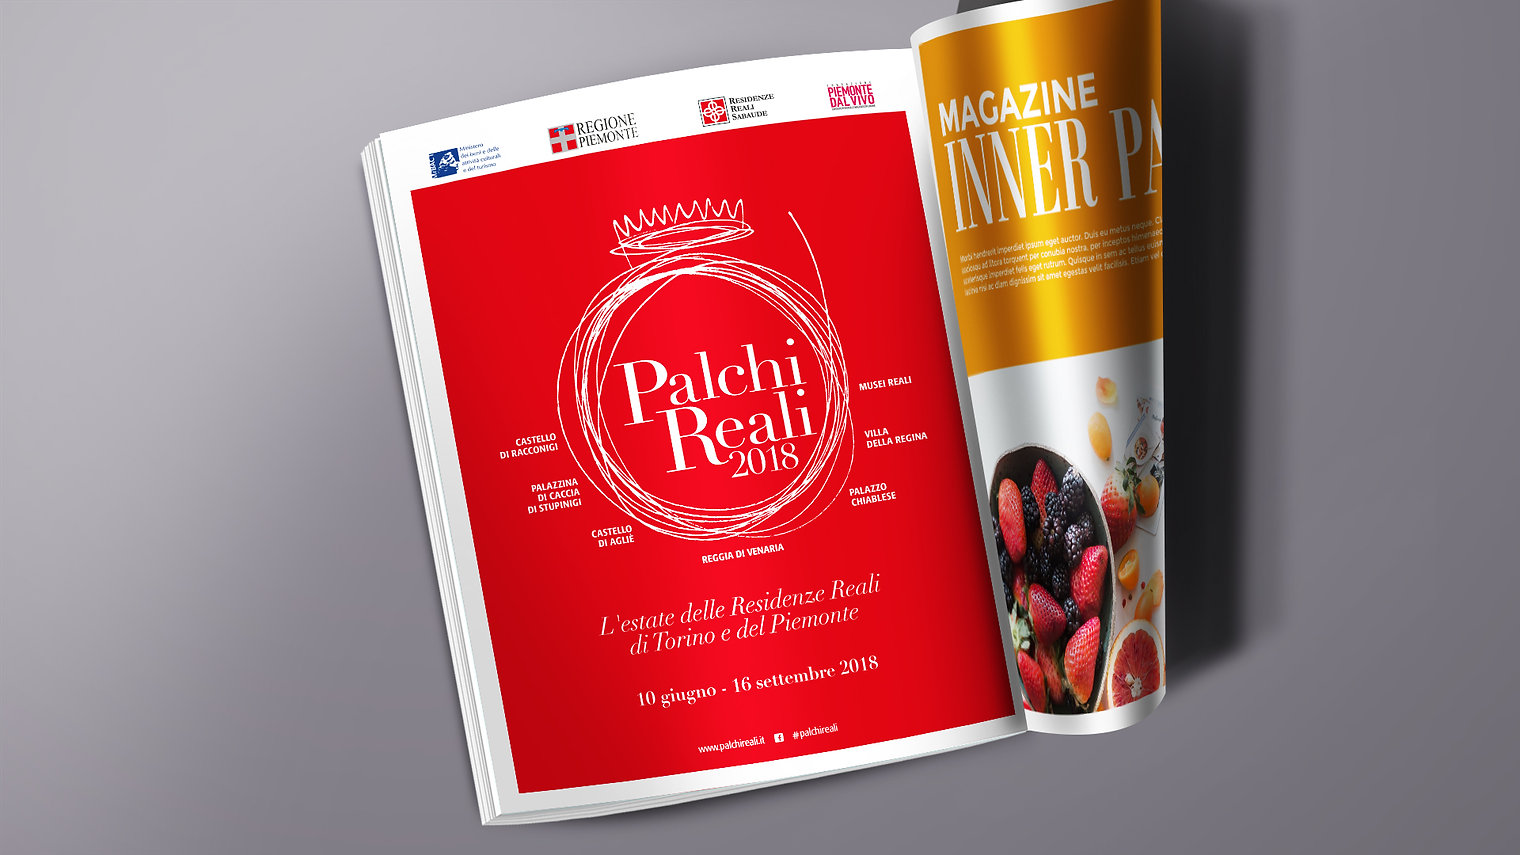 PALCHI REALI - Advertising.jpg